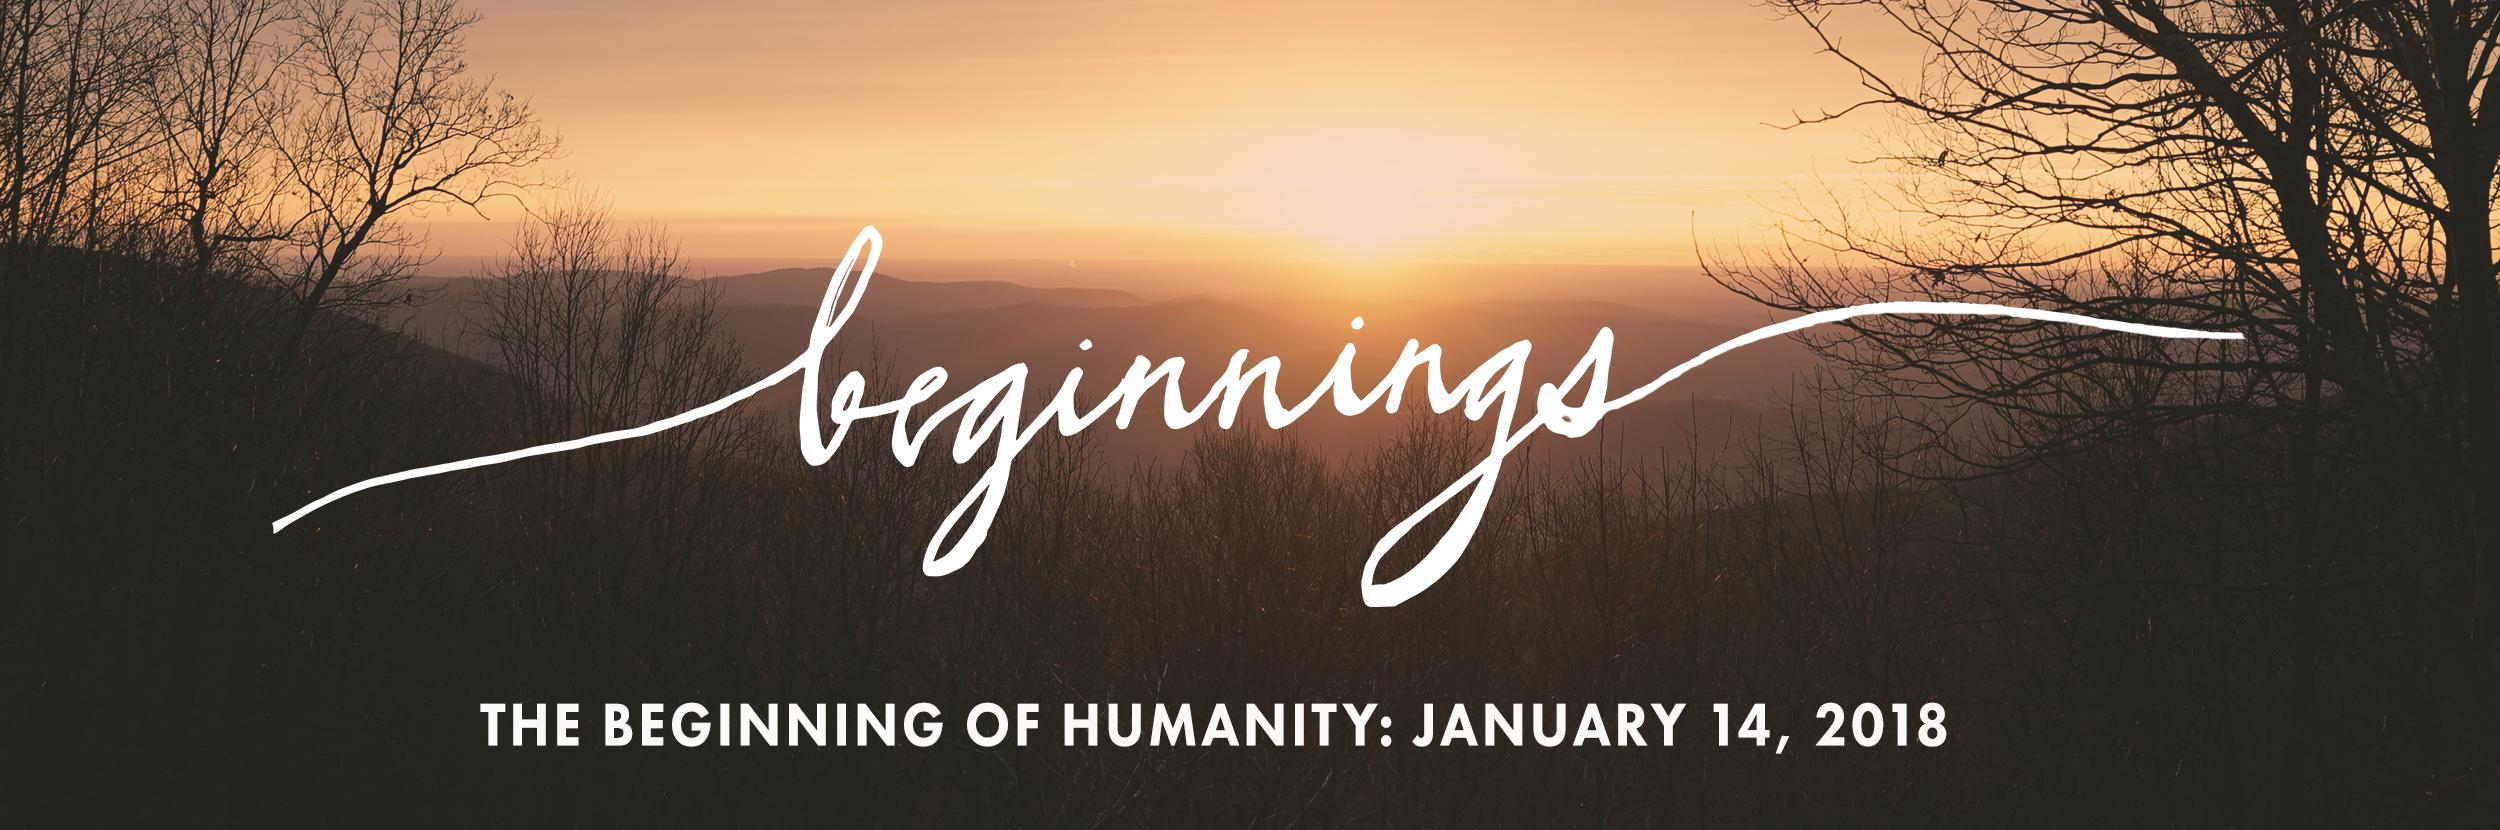 2. Humanity Banner.jpg